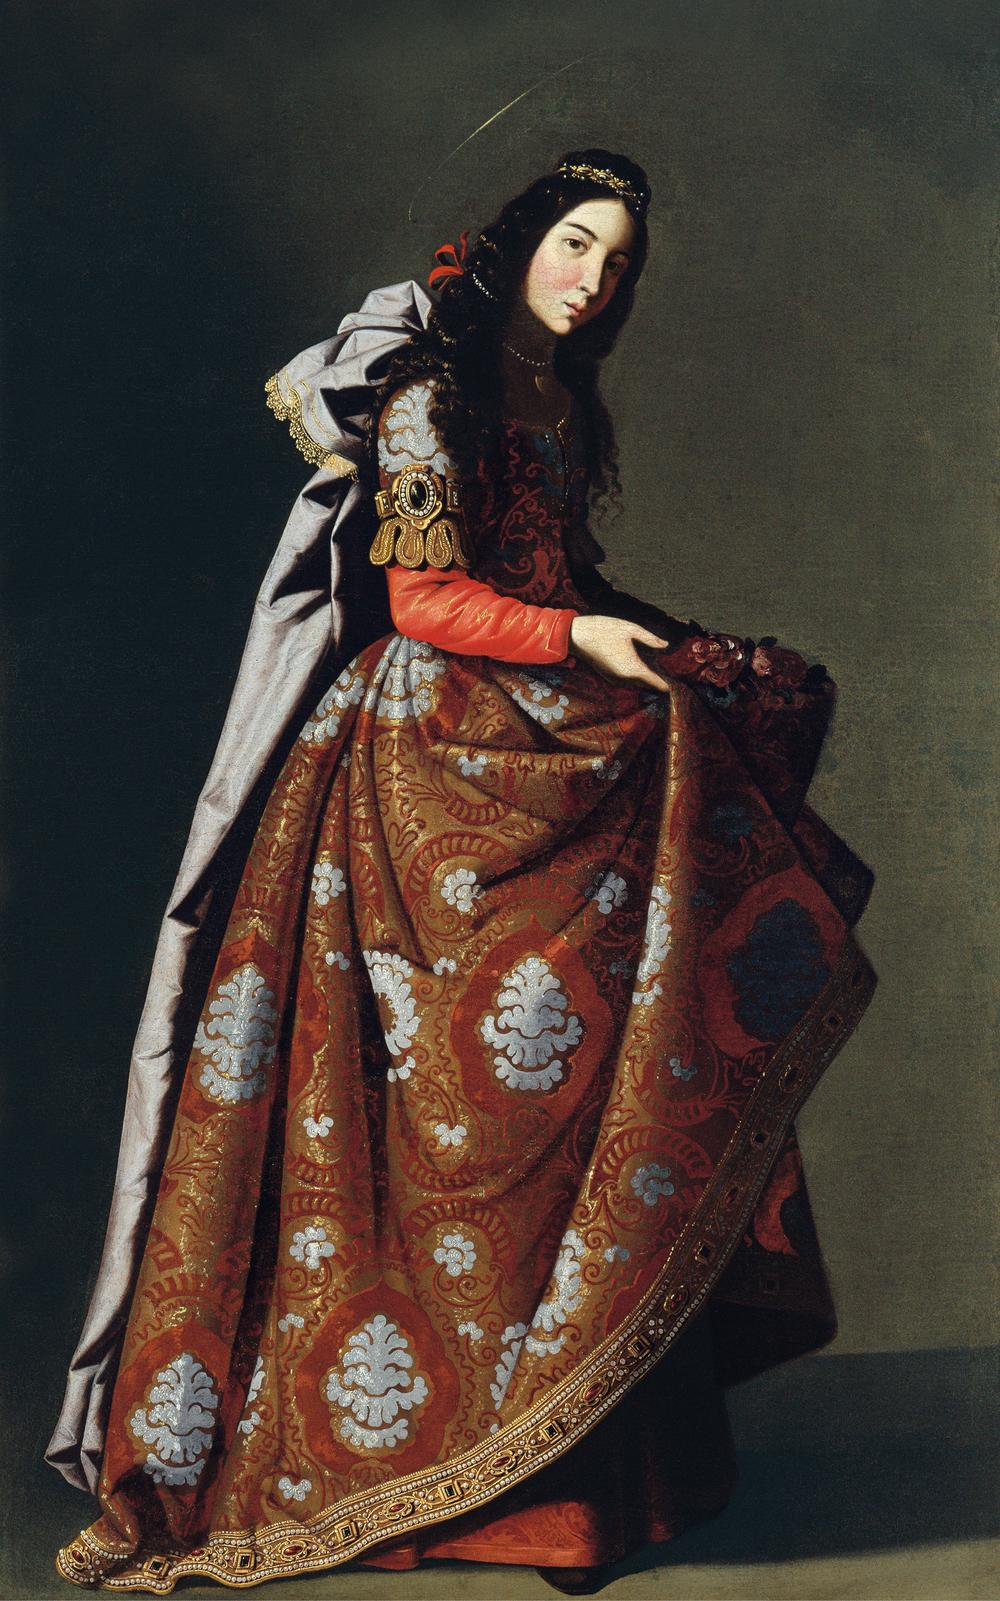 Francisco de Zurbarán · Santa Casilda, c. 1630-16353 (Saint Casilda) · Óleo sobre lienzo, 171 x 107 cm · Museo Thyssen-Bornemisza, Madrid.